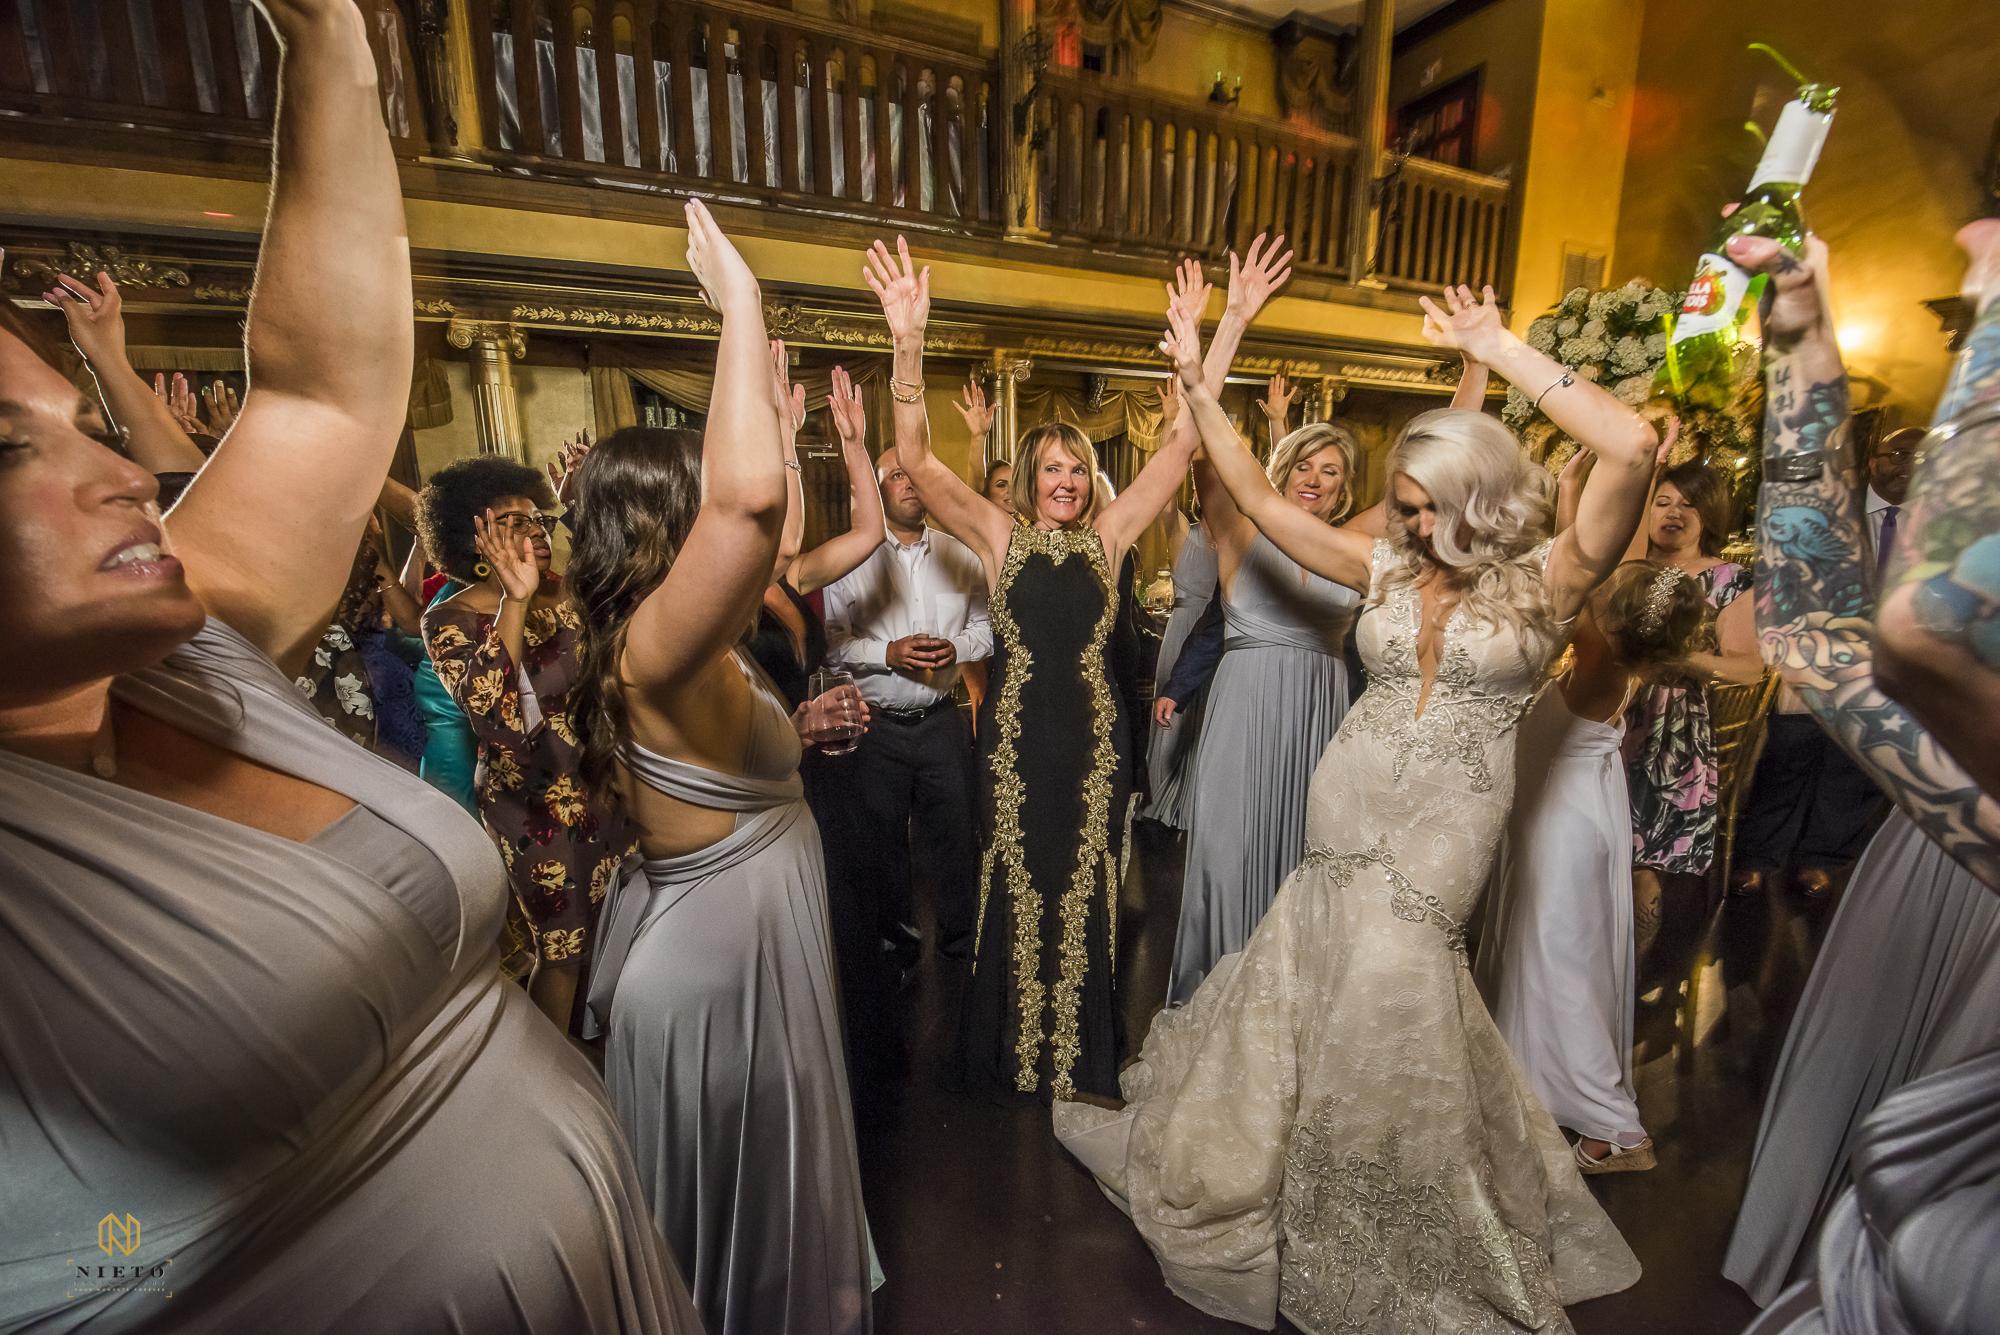 Barclay Villa Wedding - Tegran & Suzanne - 00624.jpg